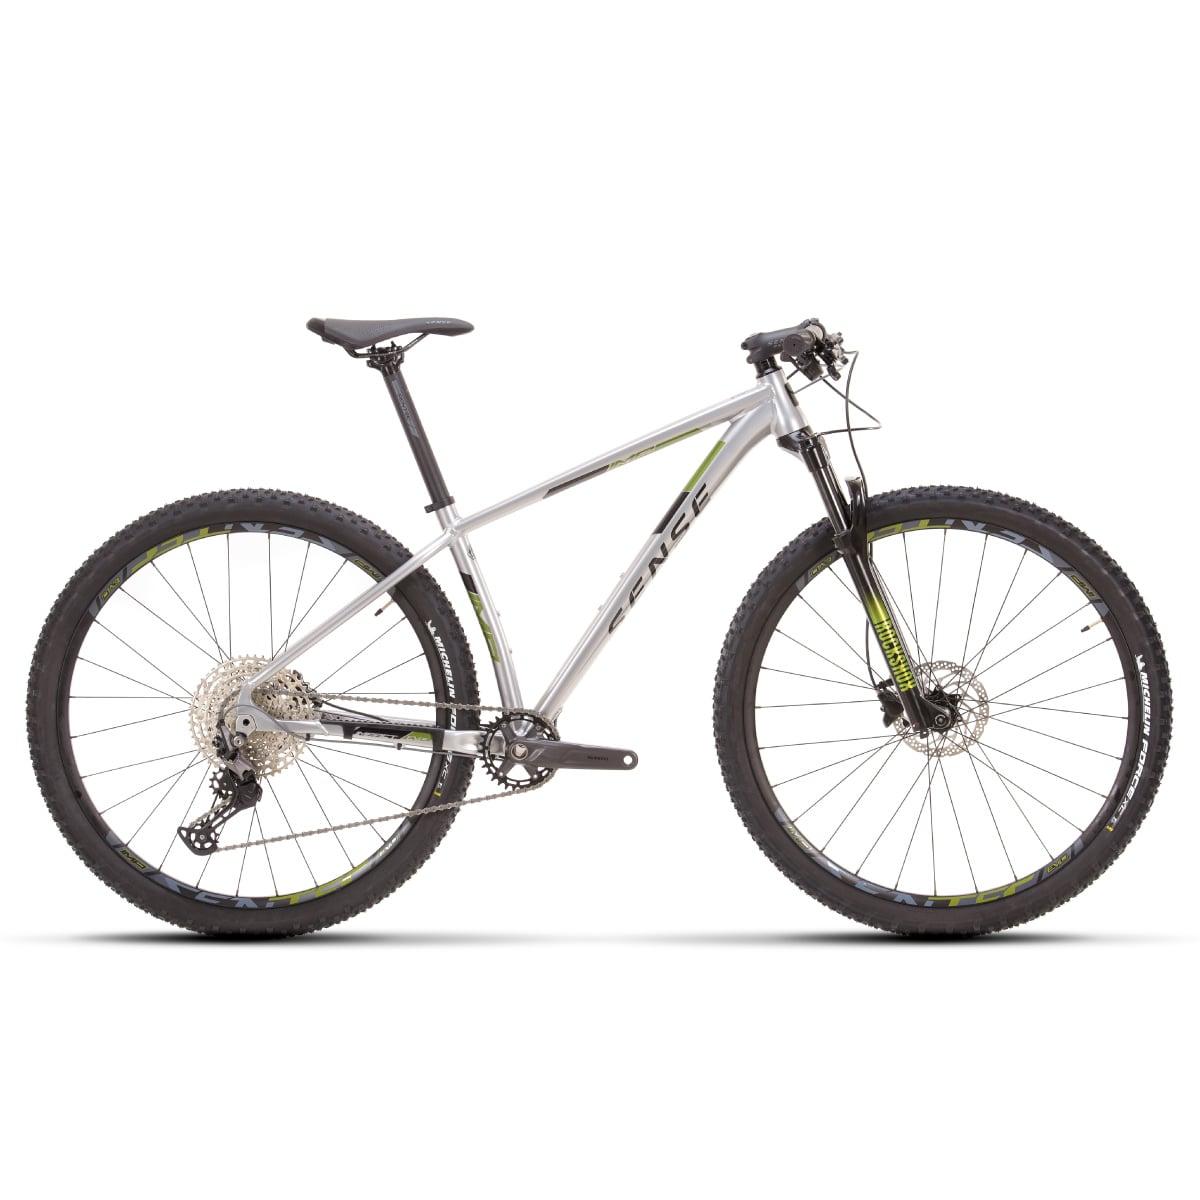 Bike Sense Impact Evo 2021 Shimano Deore 12v Aluminio e Verde